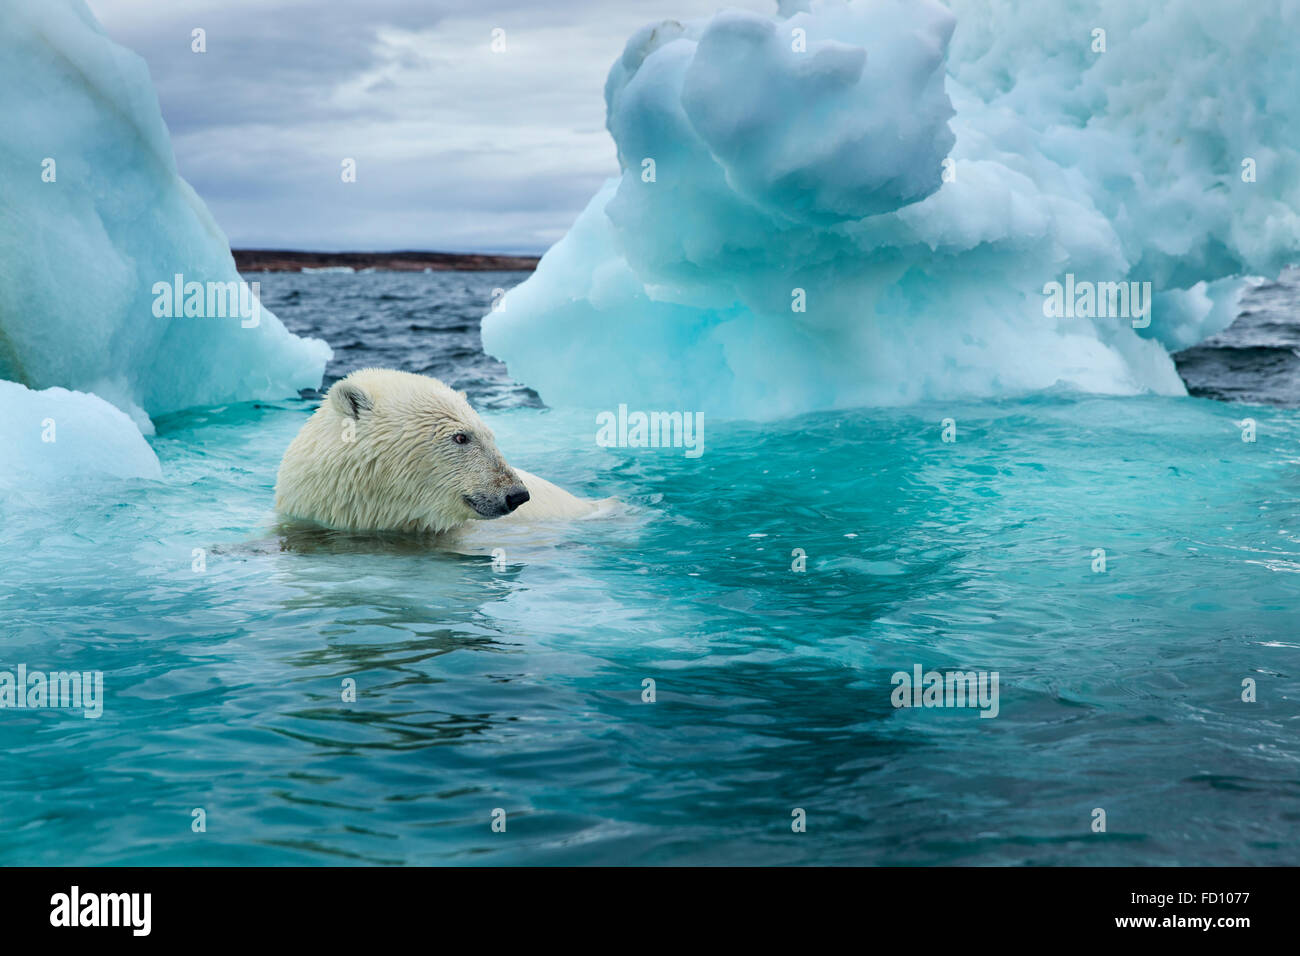 Canada, Nunavut Territory, Repulse Bay, Polar Bear (Ursus maritimus) swimming beside melting iceberg near Arctic Stock Photo